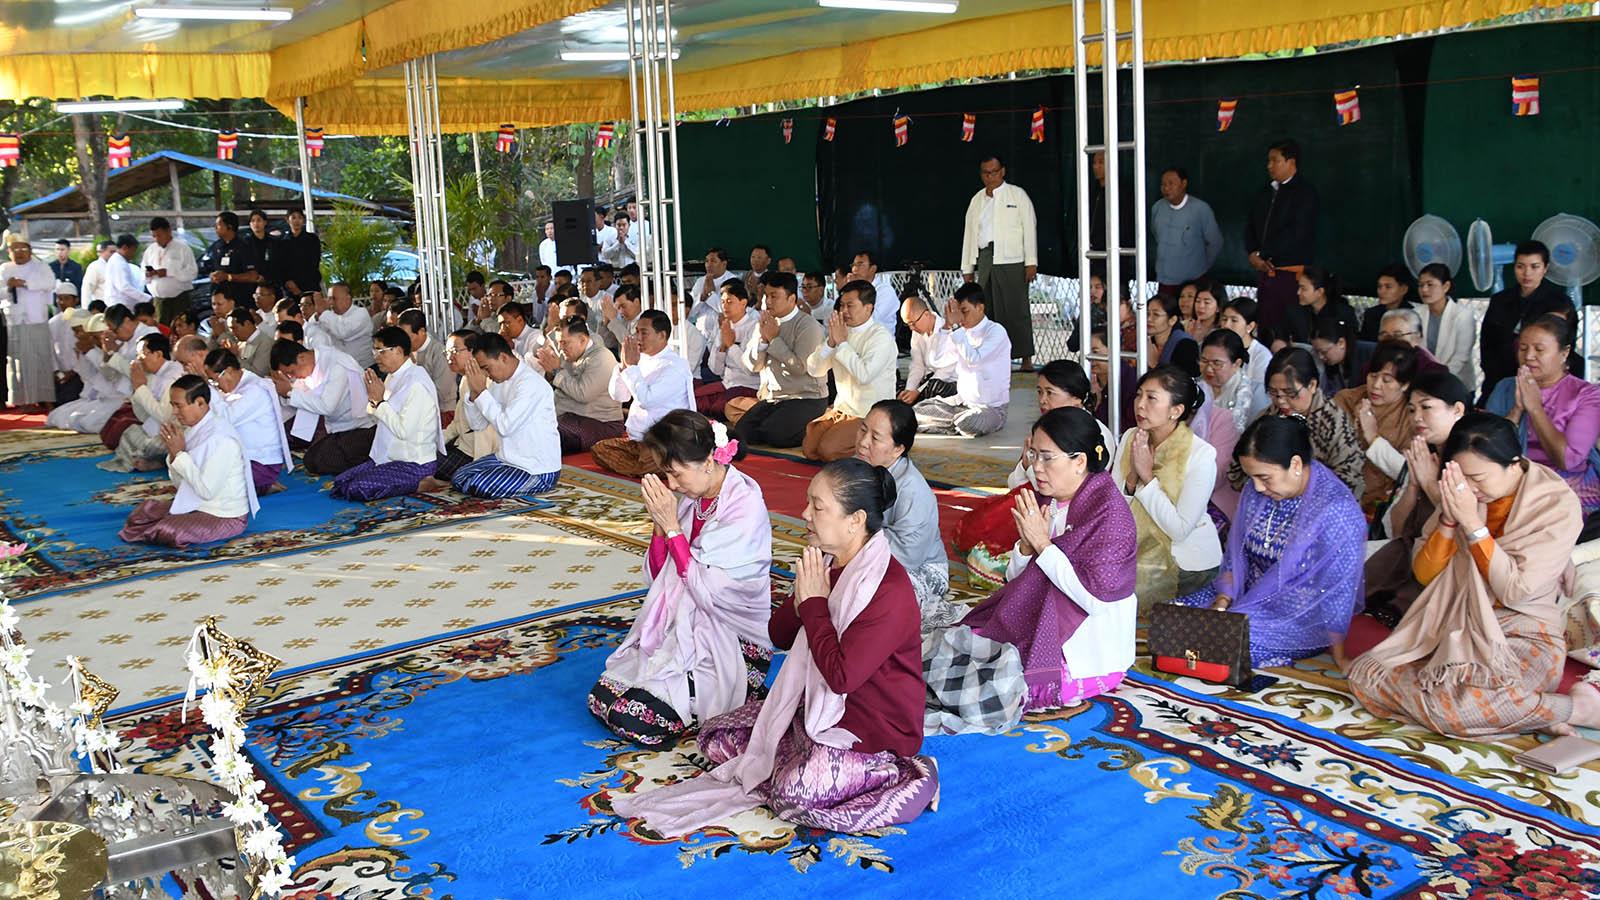 A congregation led by President U Win Myint, First Lady Daw Cho Cho and State Counsellor Daw Aung San Suu Kyi receive the Nine Precepts from Sayadaw Agga Maha Saddhamma Jotikadaja Bhaddanta Vimala Bhuddi of Pyinmana Mingalar Zeyone Pali Takkatho monastery yesterday.Photo: MNA